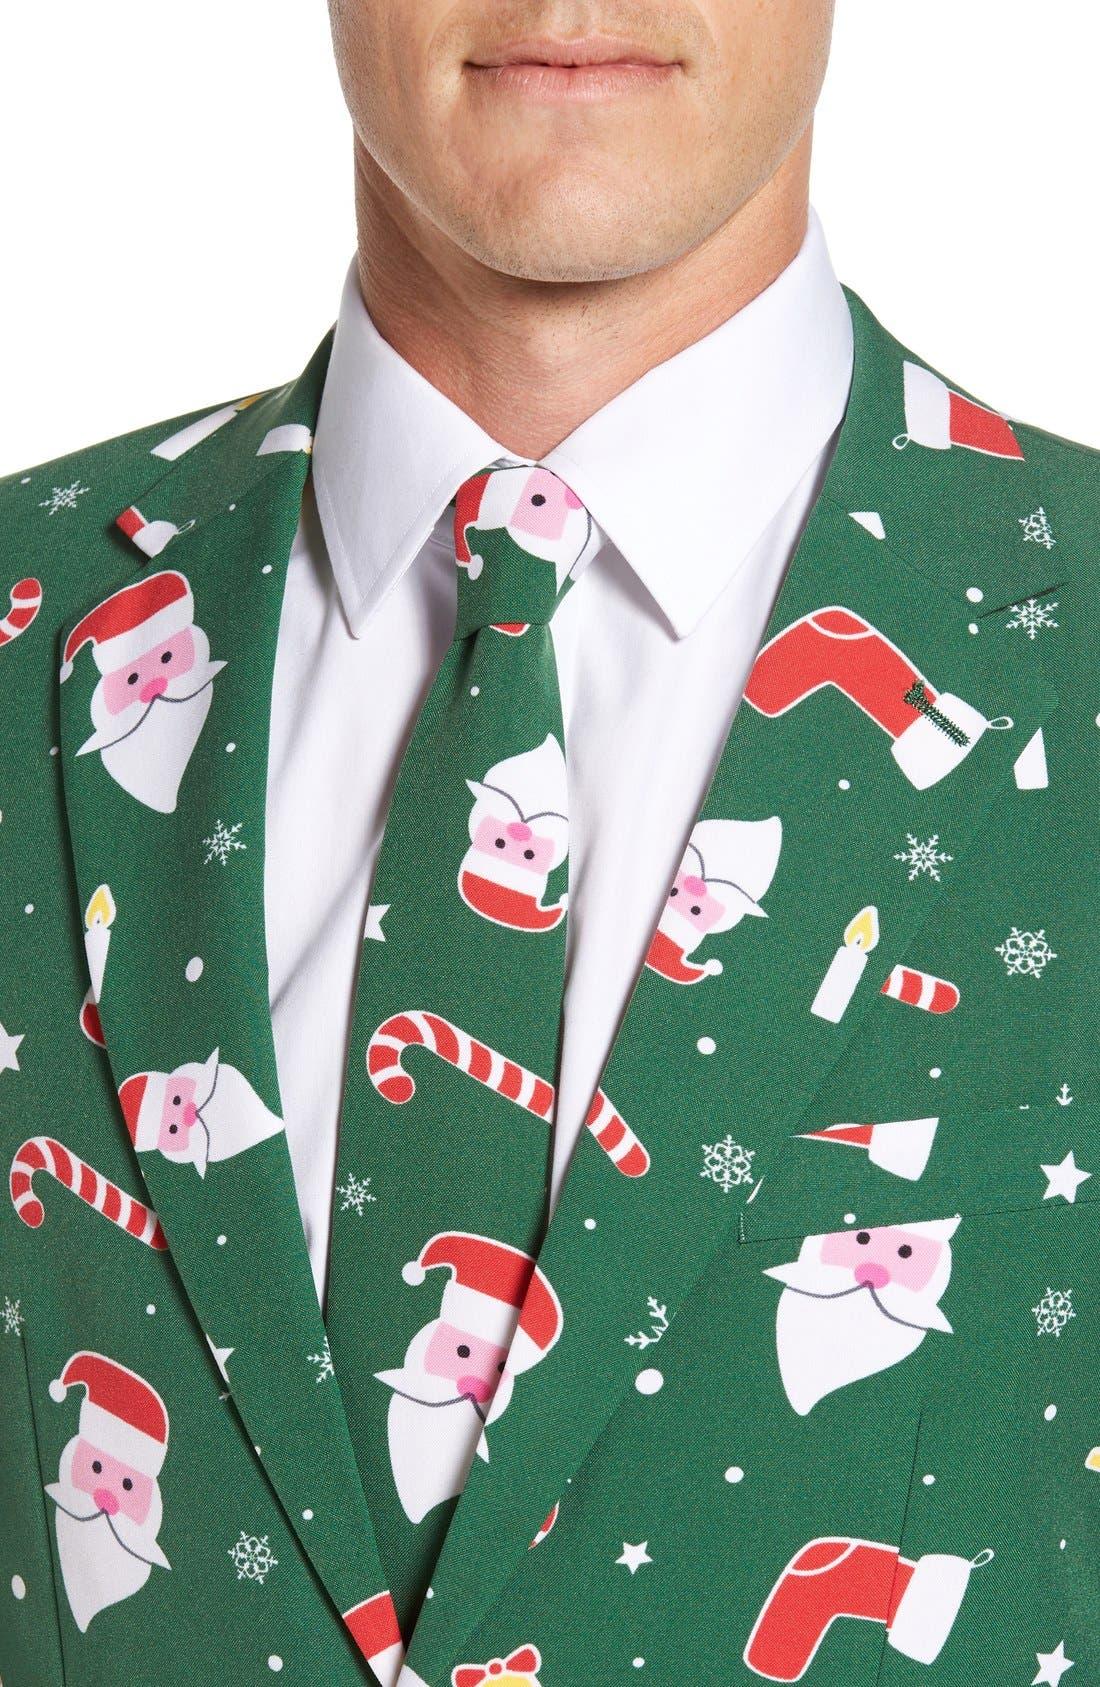 'Santaboss' Trim Fit Two-Piece Suit with Tie,                             Alternate thumbnail 5, color,                             301